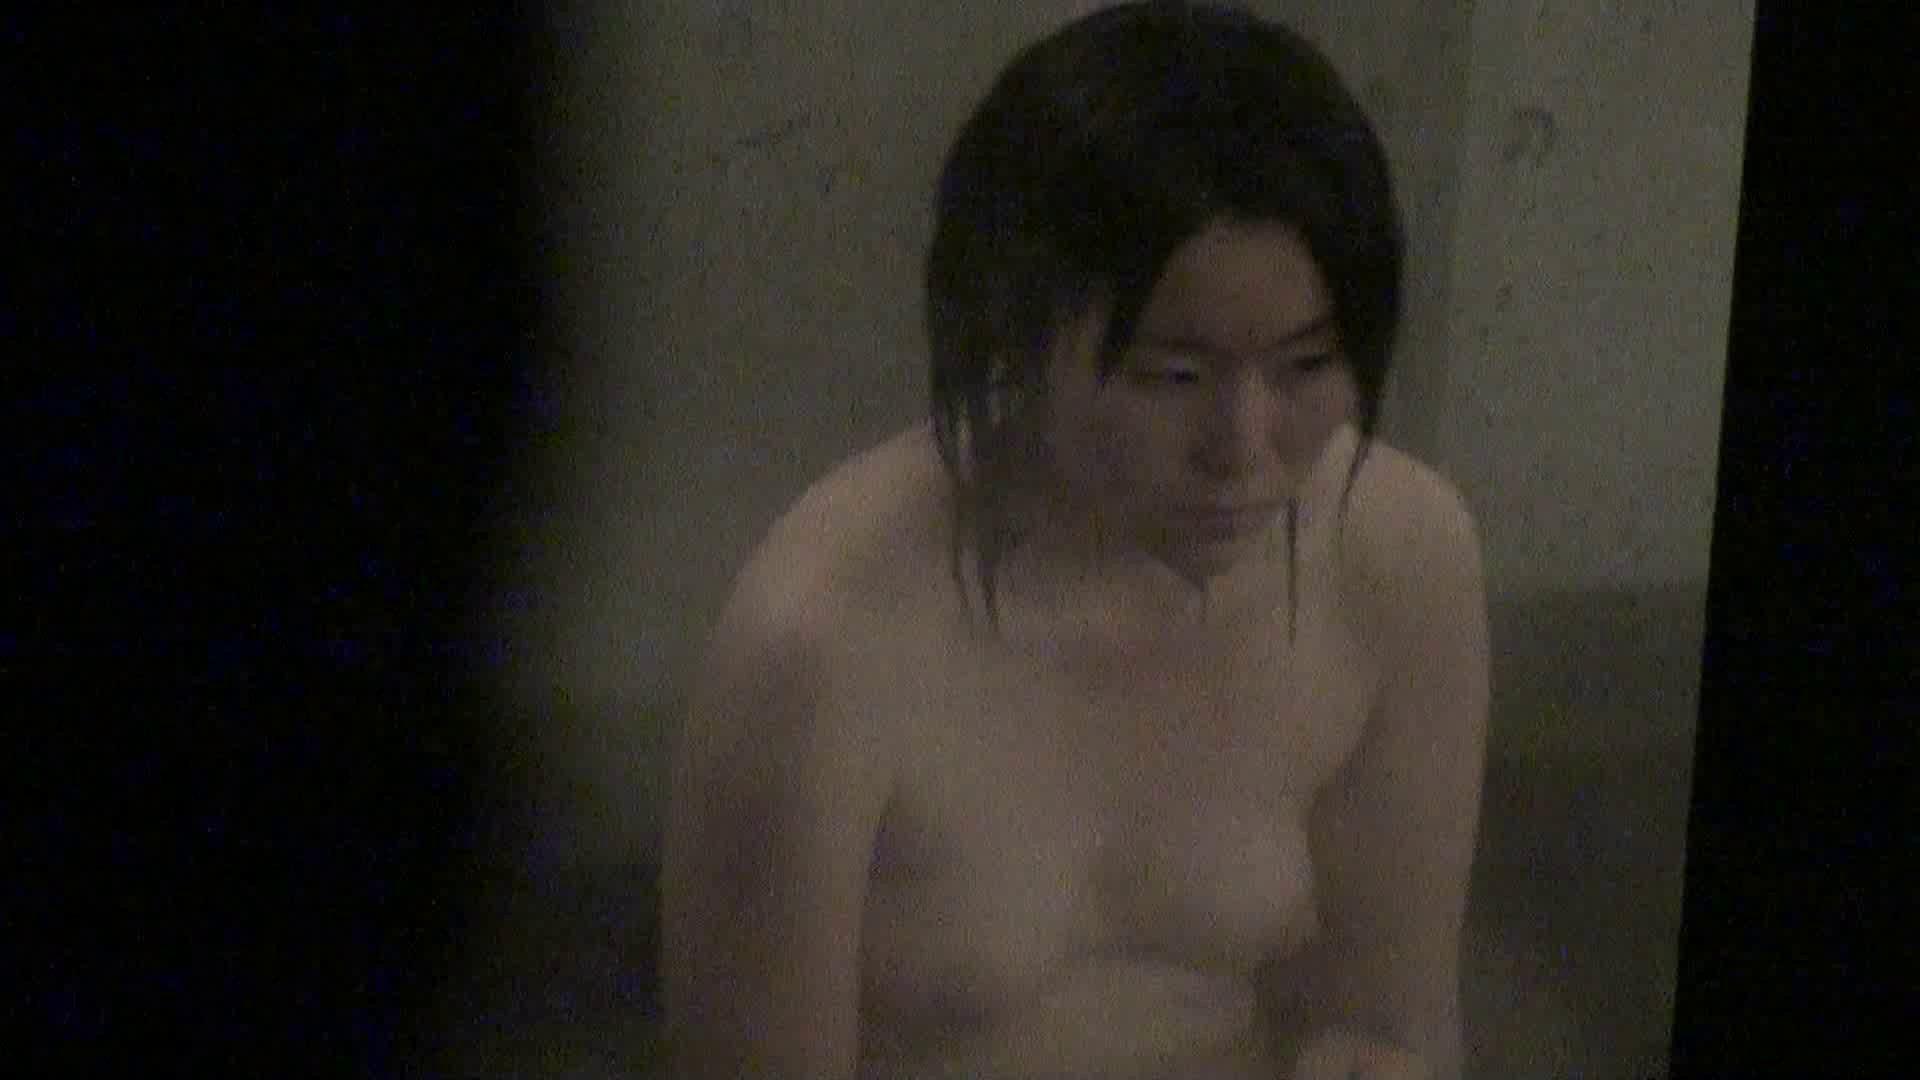 Aquaな露天風呂Vol.369 露天風呂 ワレメ動画紹介 108連発 56